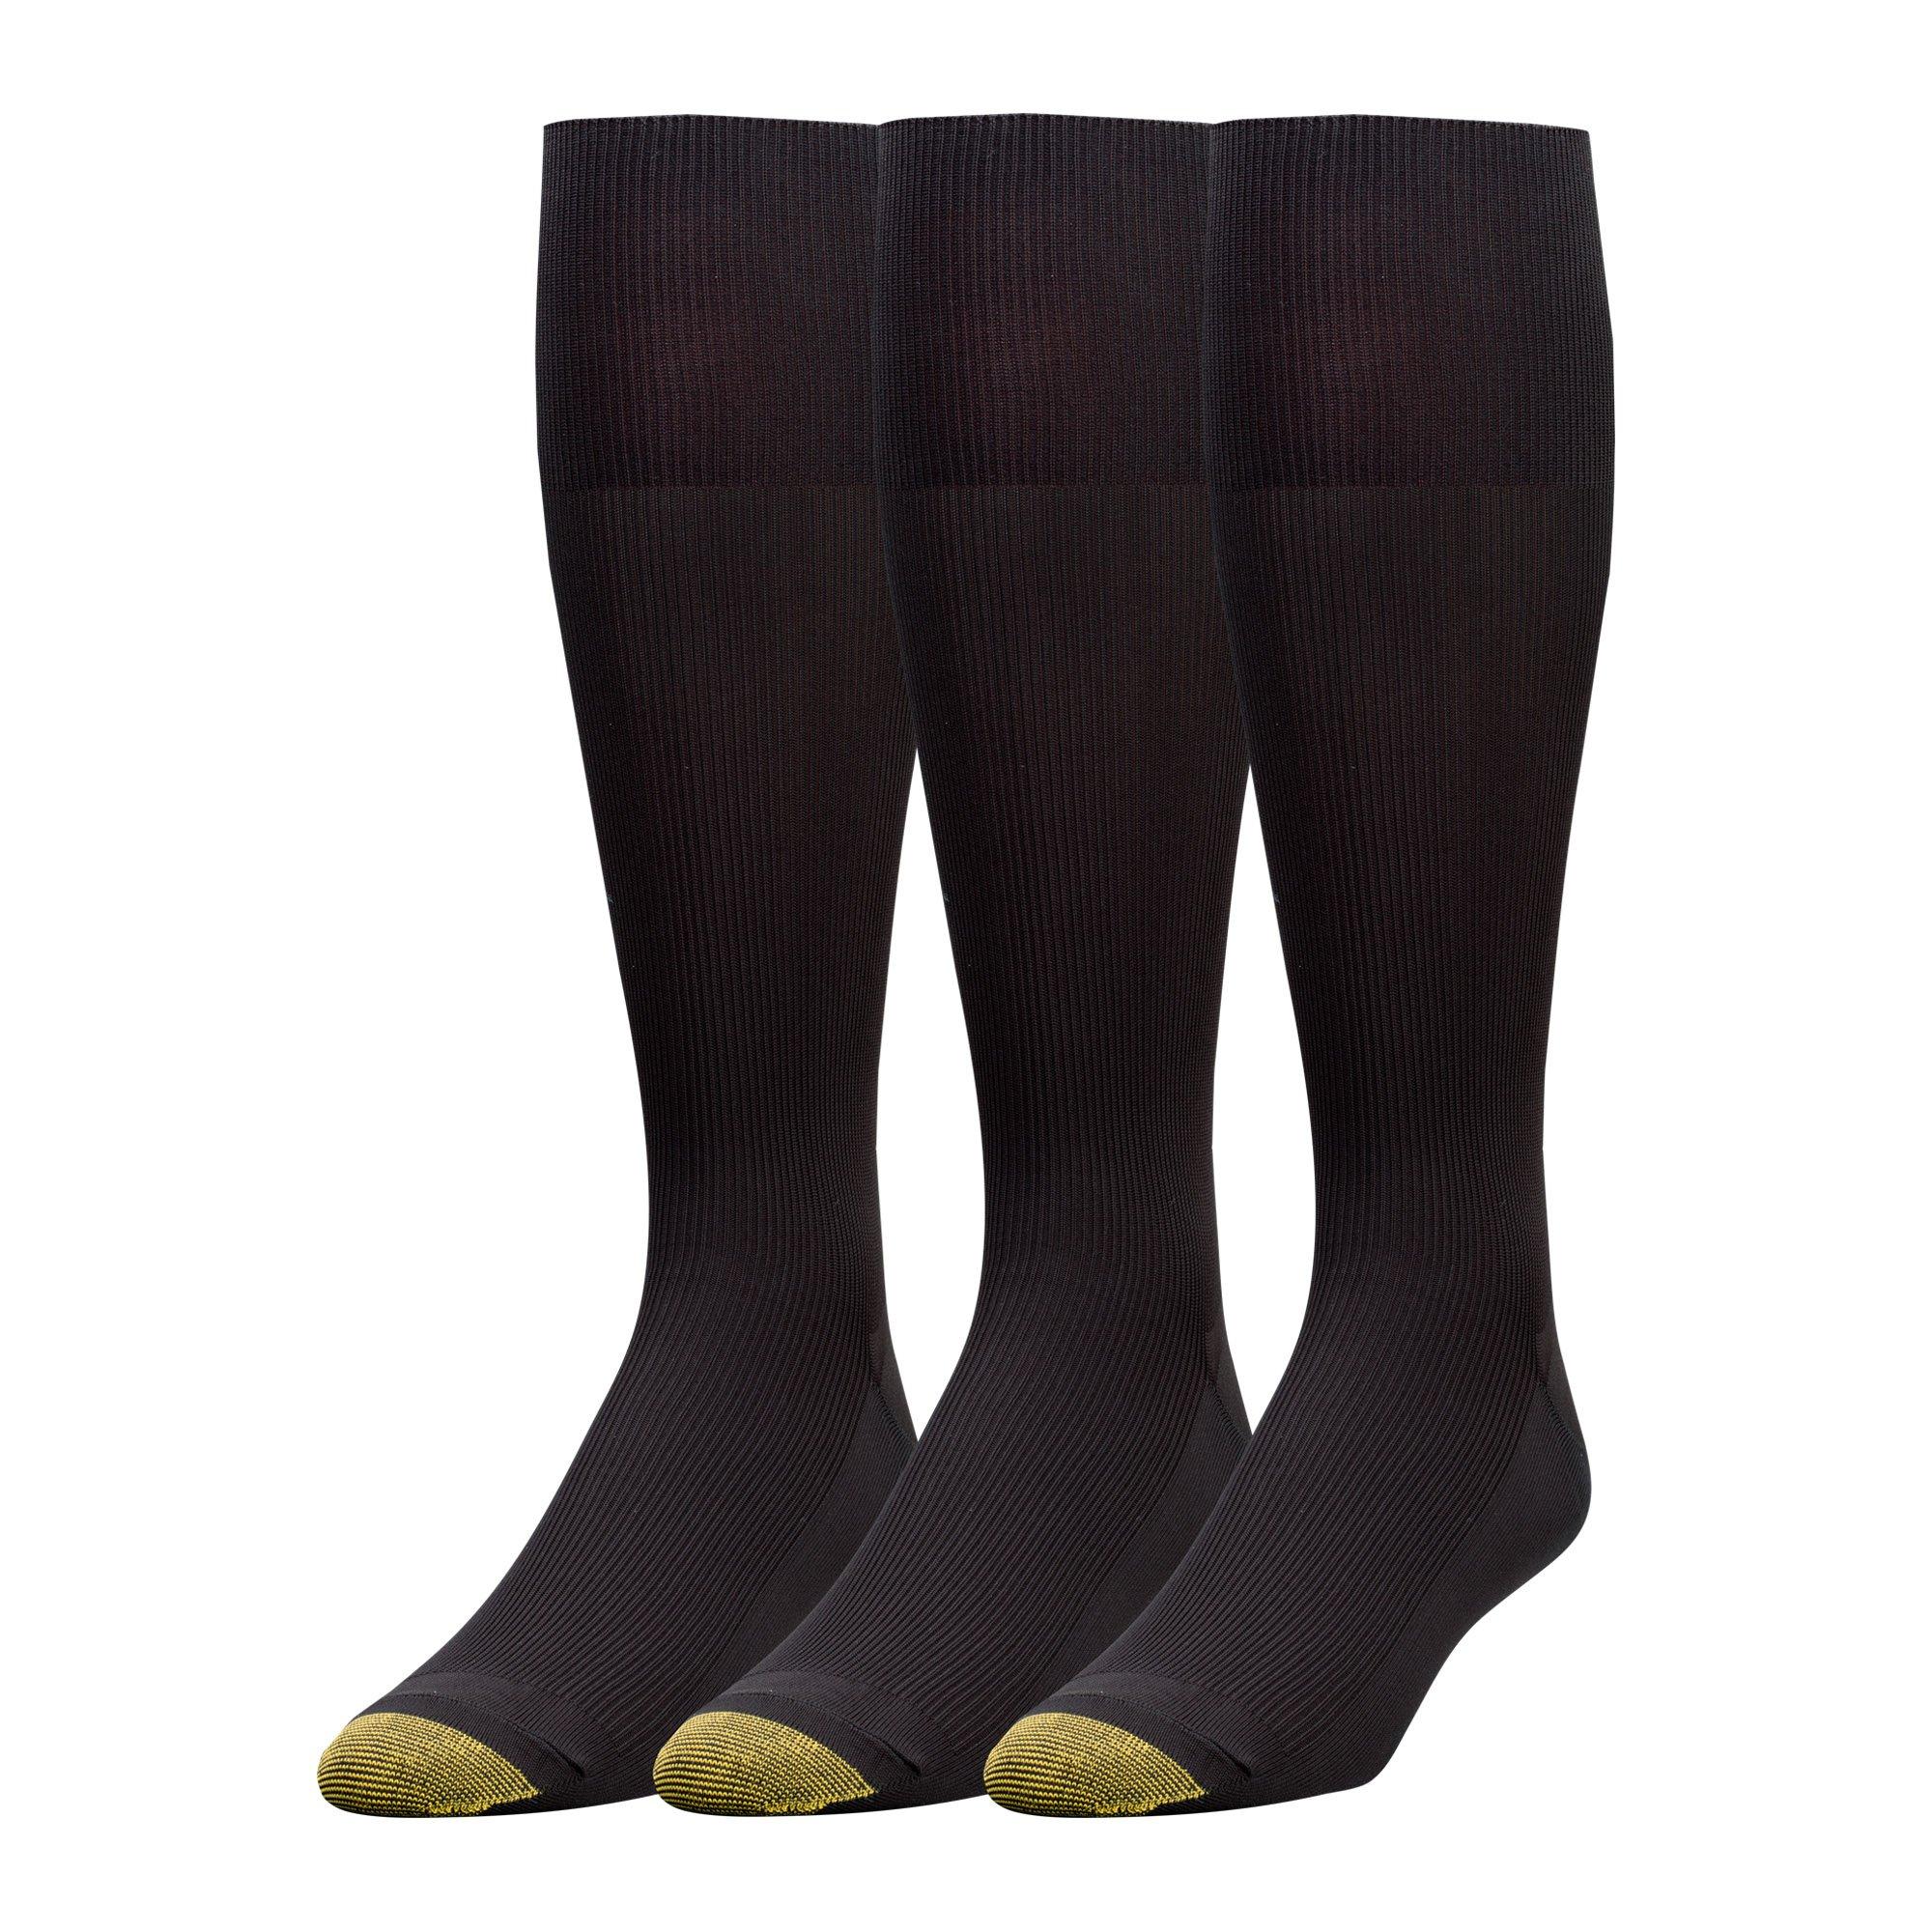 Gold Toe Men's 3-Pack Metropolitan Over-the-Calf Dress Socks, Black, 10-13 (Shoe Size 6-12.5) by Gold Toe